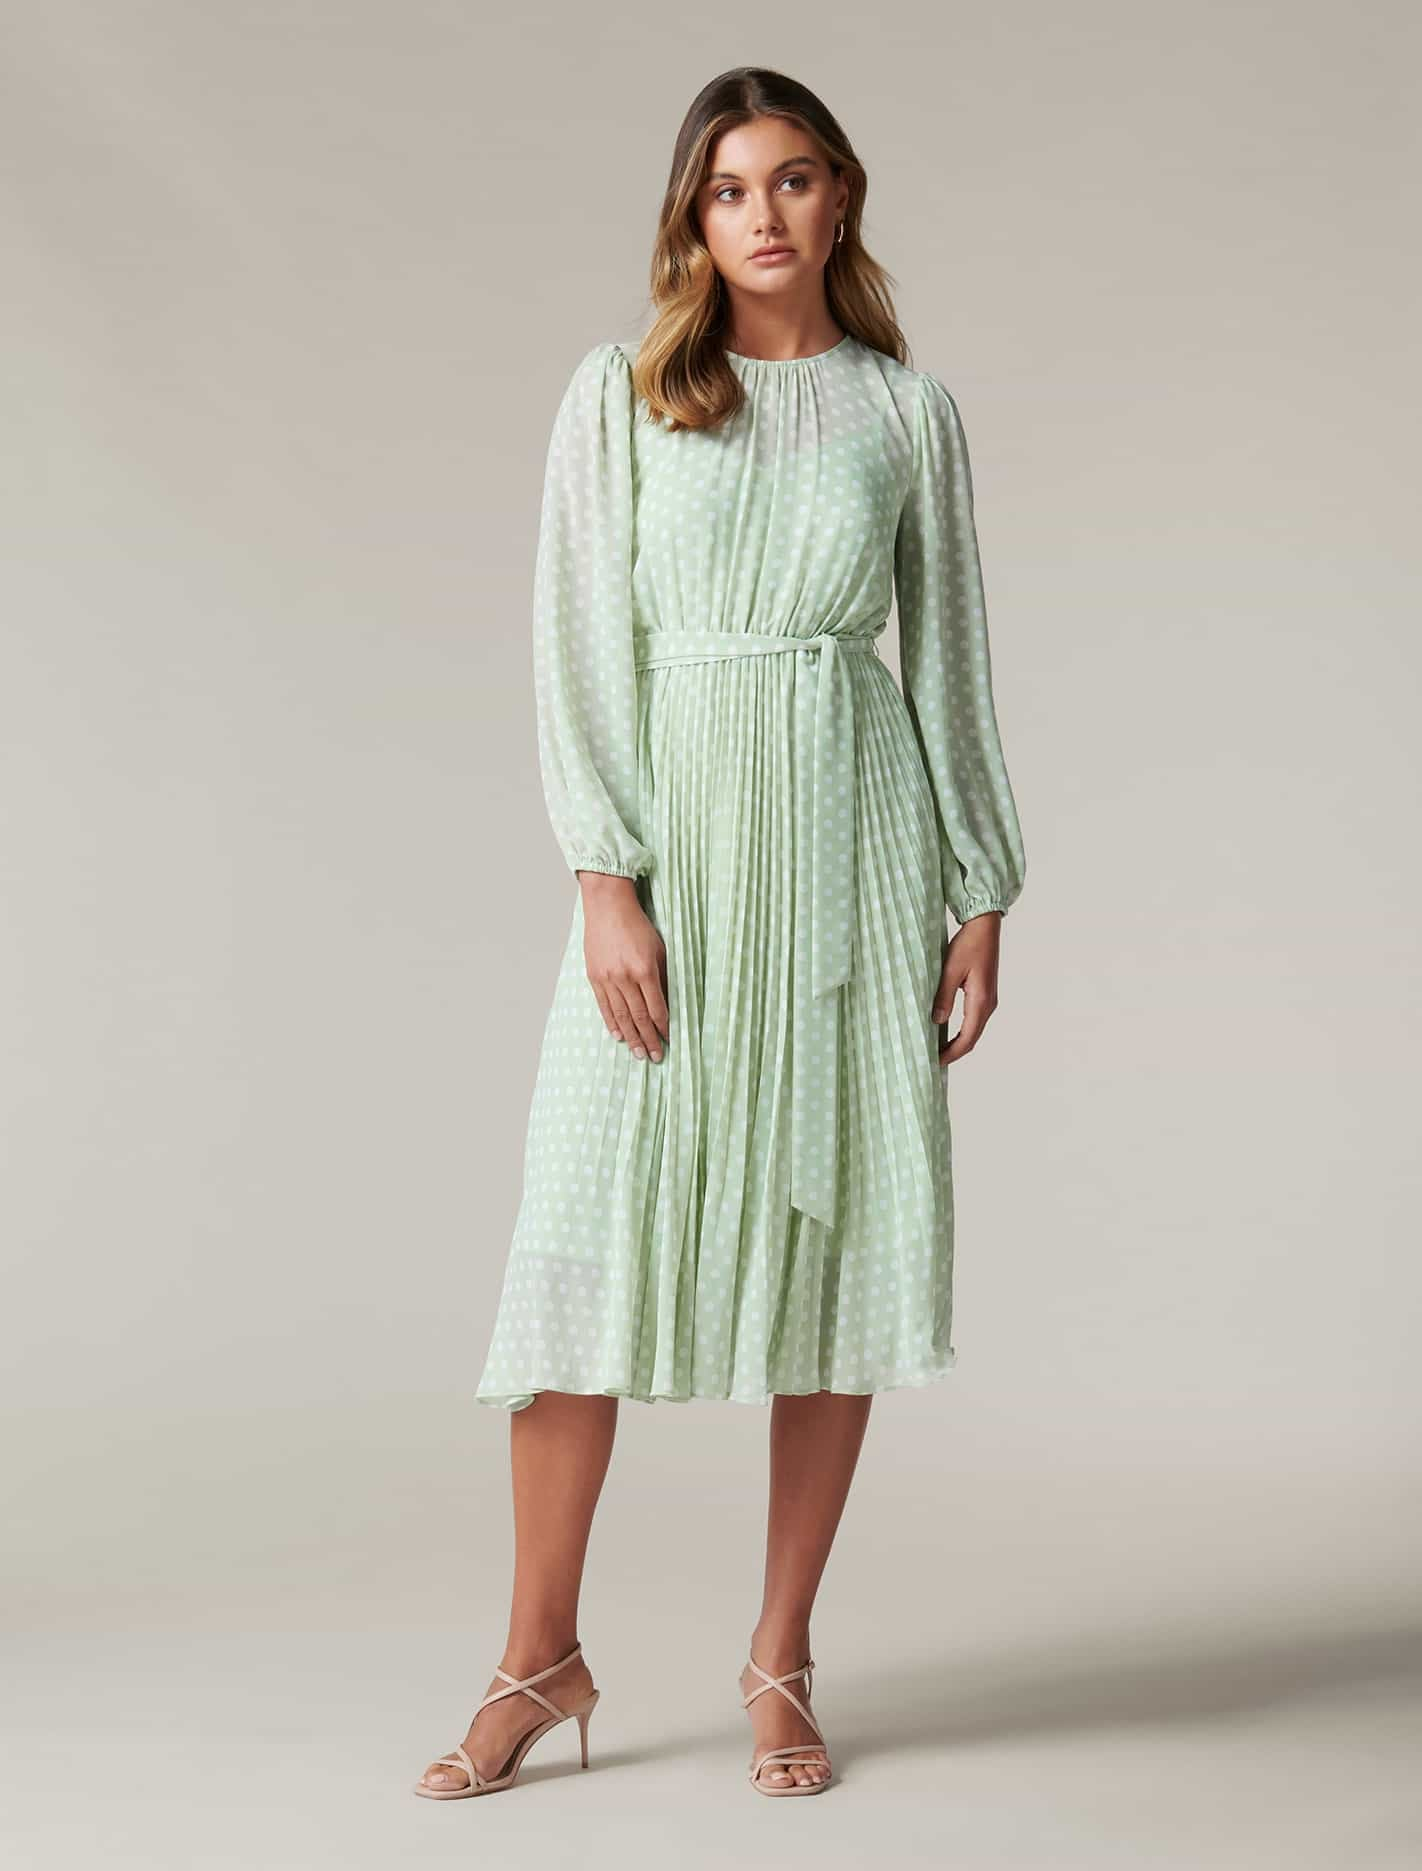 1980s Clothing, Fashion | 80s Style Clothes Fiona Petite Pleat Midi Dress - Herb Havana Spot - 12 $169.99 AT vintagedancer.com